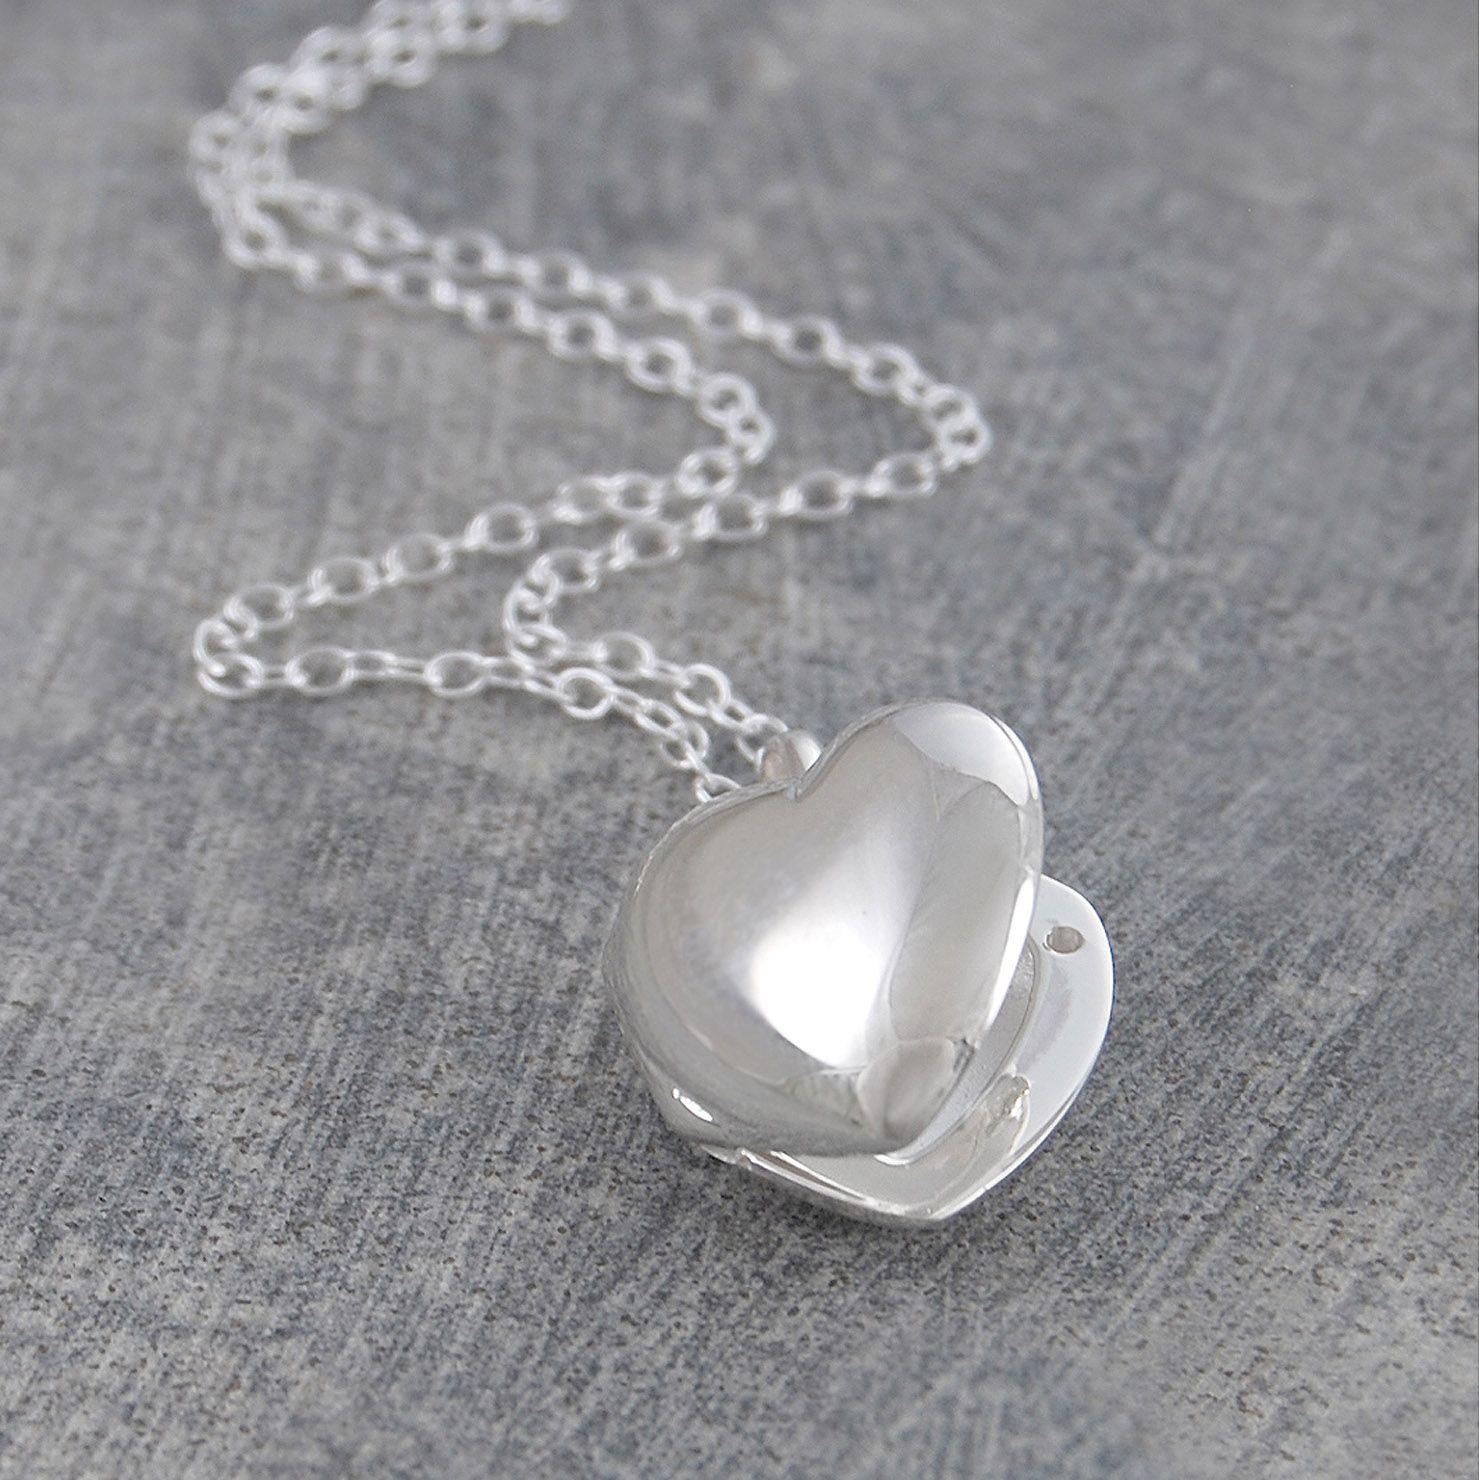 f442e59a31e864 Otis Jaxon Sterling Silver Polished Heart Locket Pendant   ACHICA ...